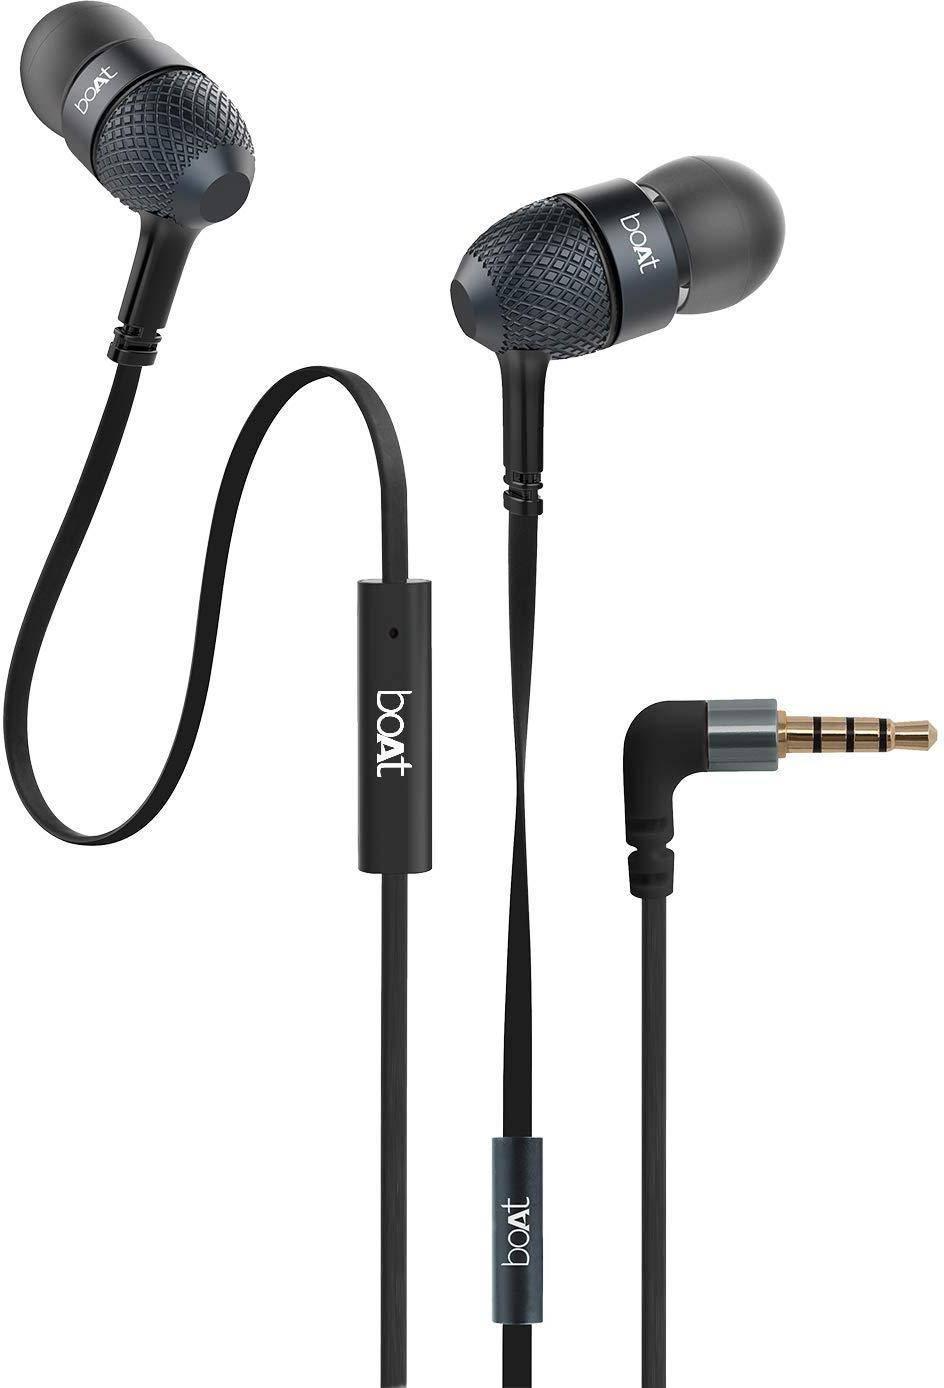 boAt BassHeads 220 super bass earphones zoom image